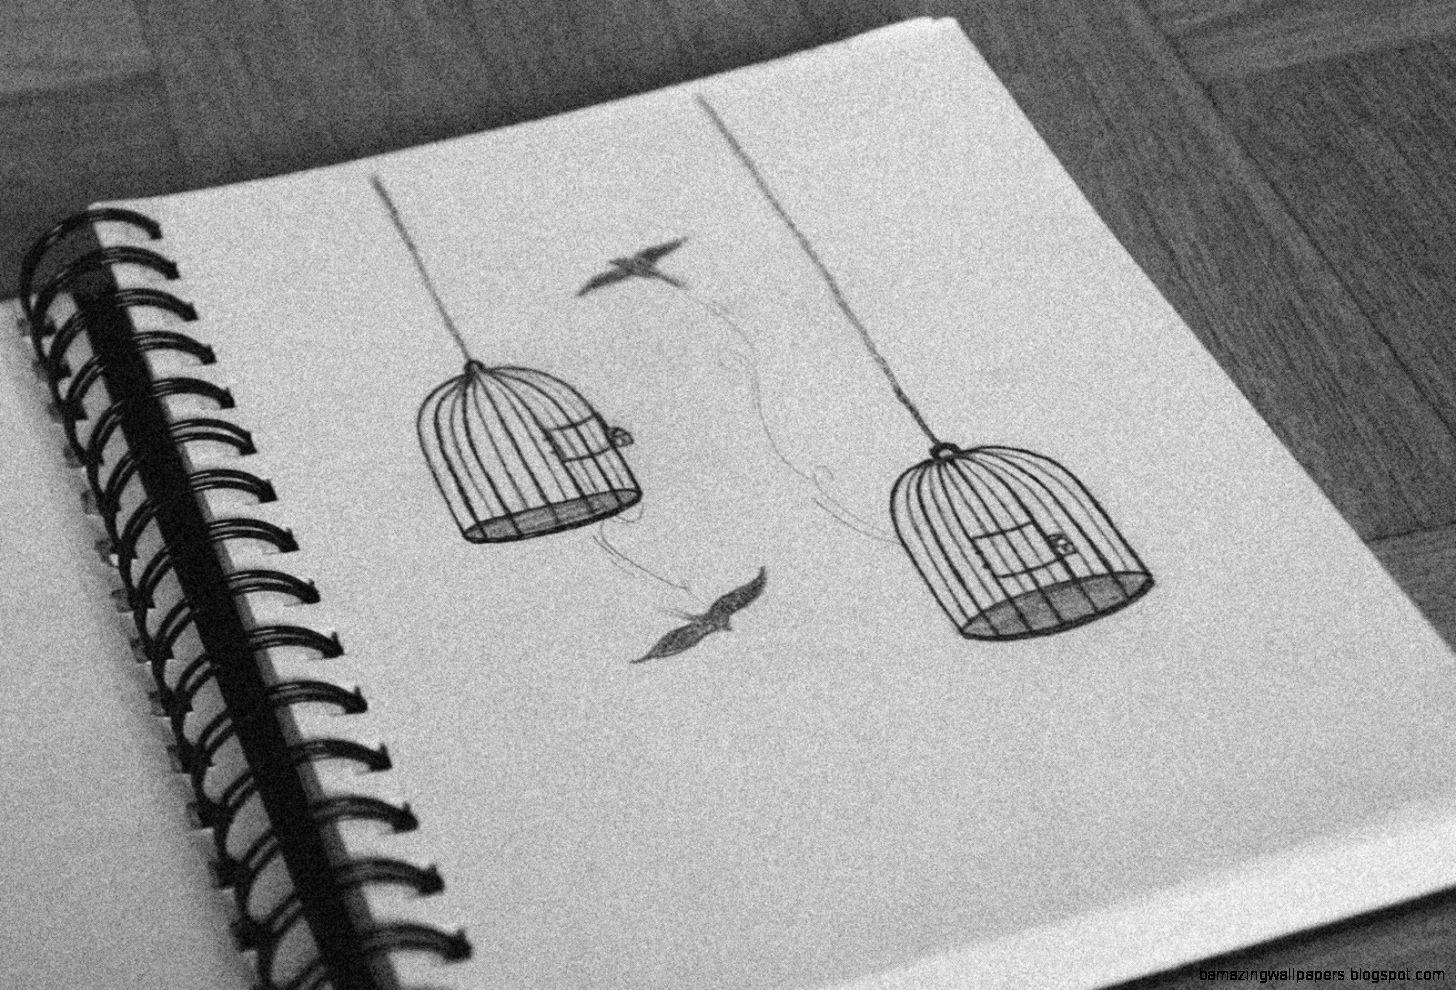 Easy Pencil Drawings Tumblr Tumblr Drawings Easy Pencil Drawings Tumblr Pencil Drawings Easy